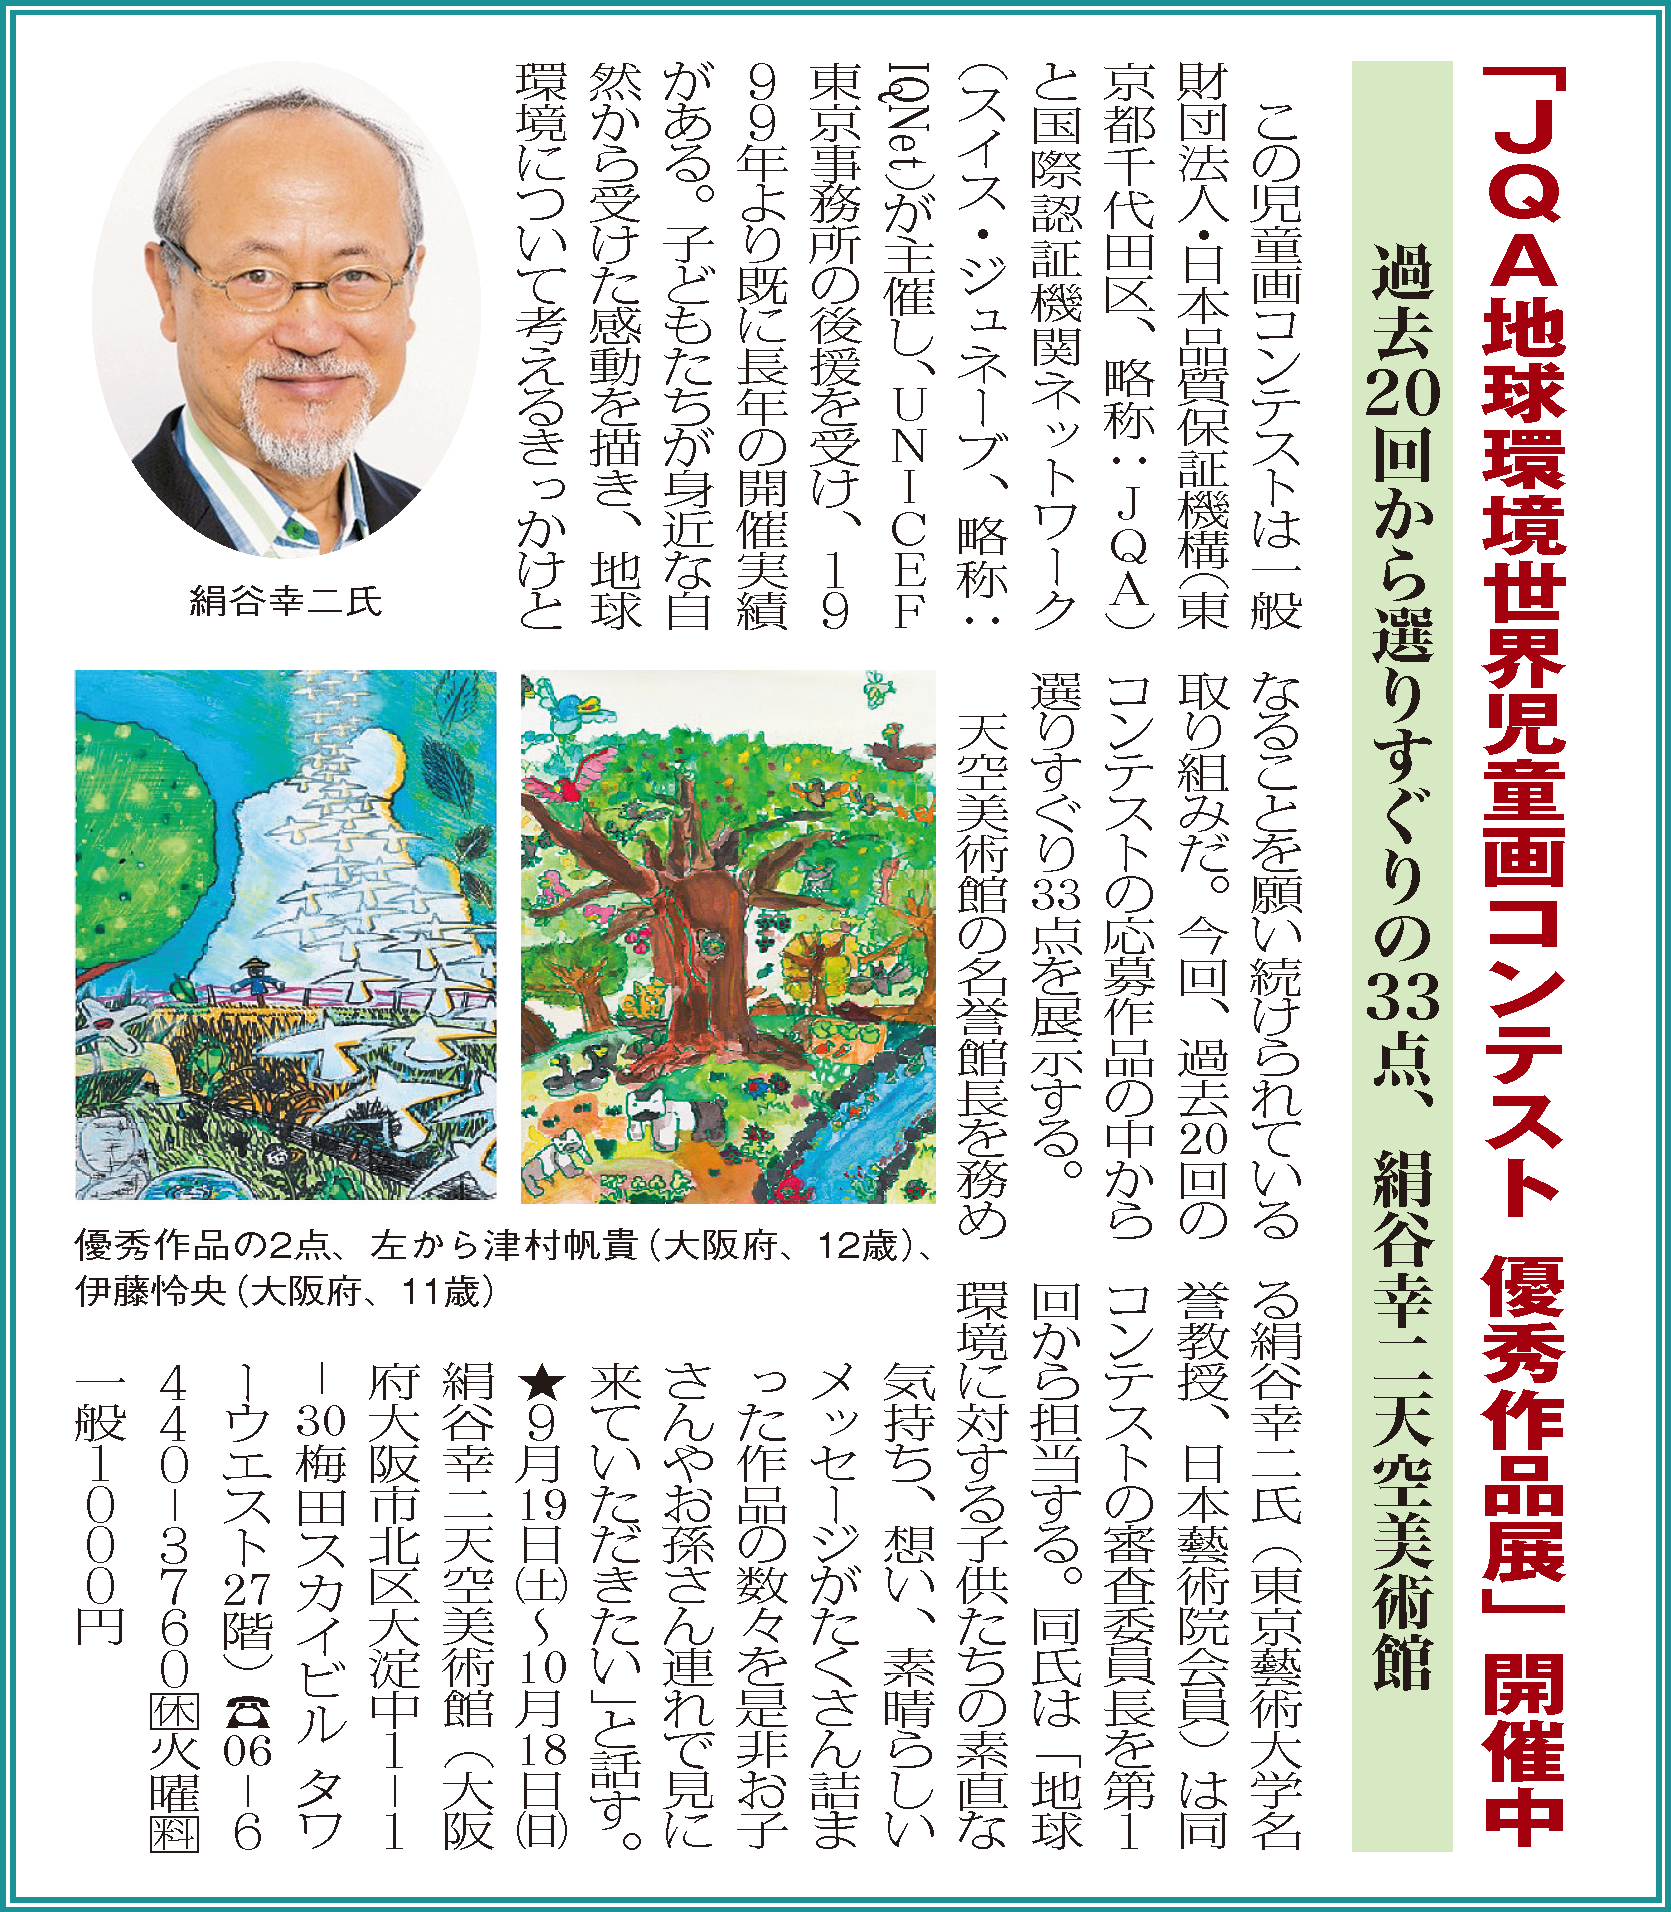 https://kinutani.jp/news/about/2020100802.jpg